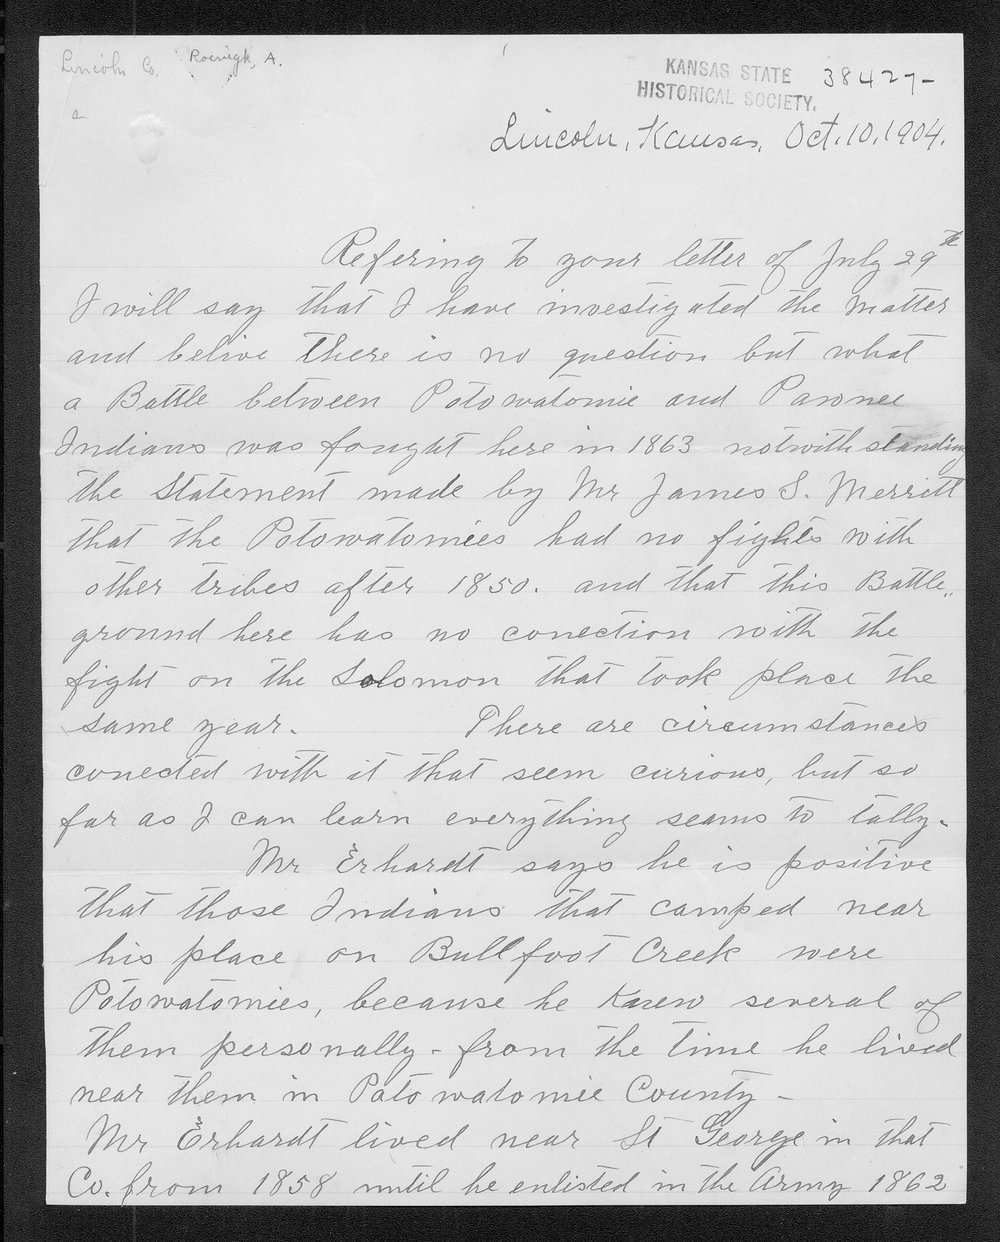 Adolph Roenigk and George W. Martin correspondence - 1